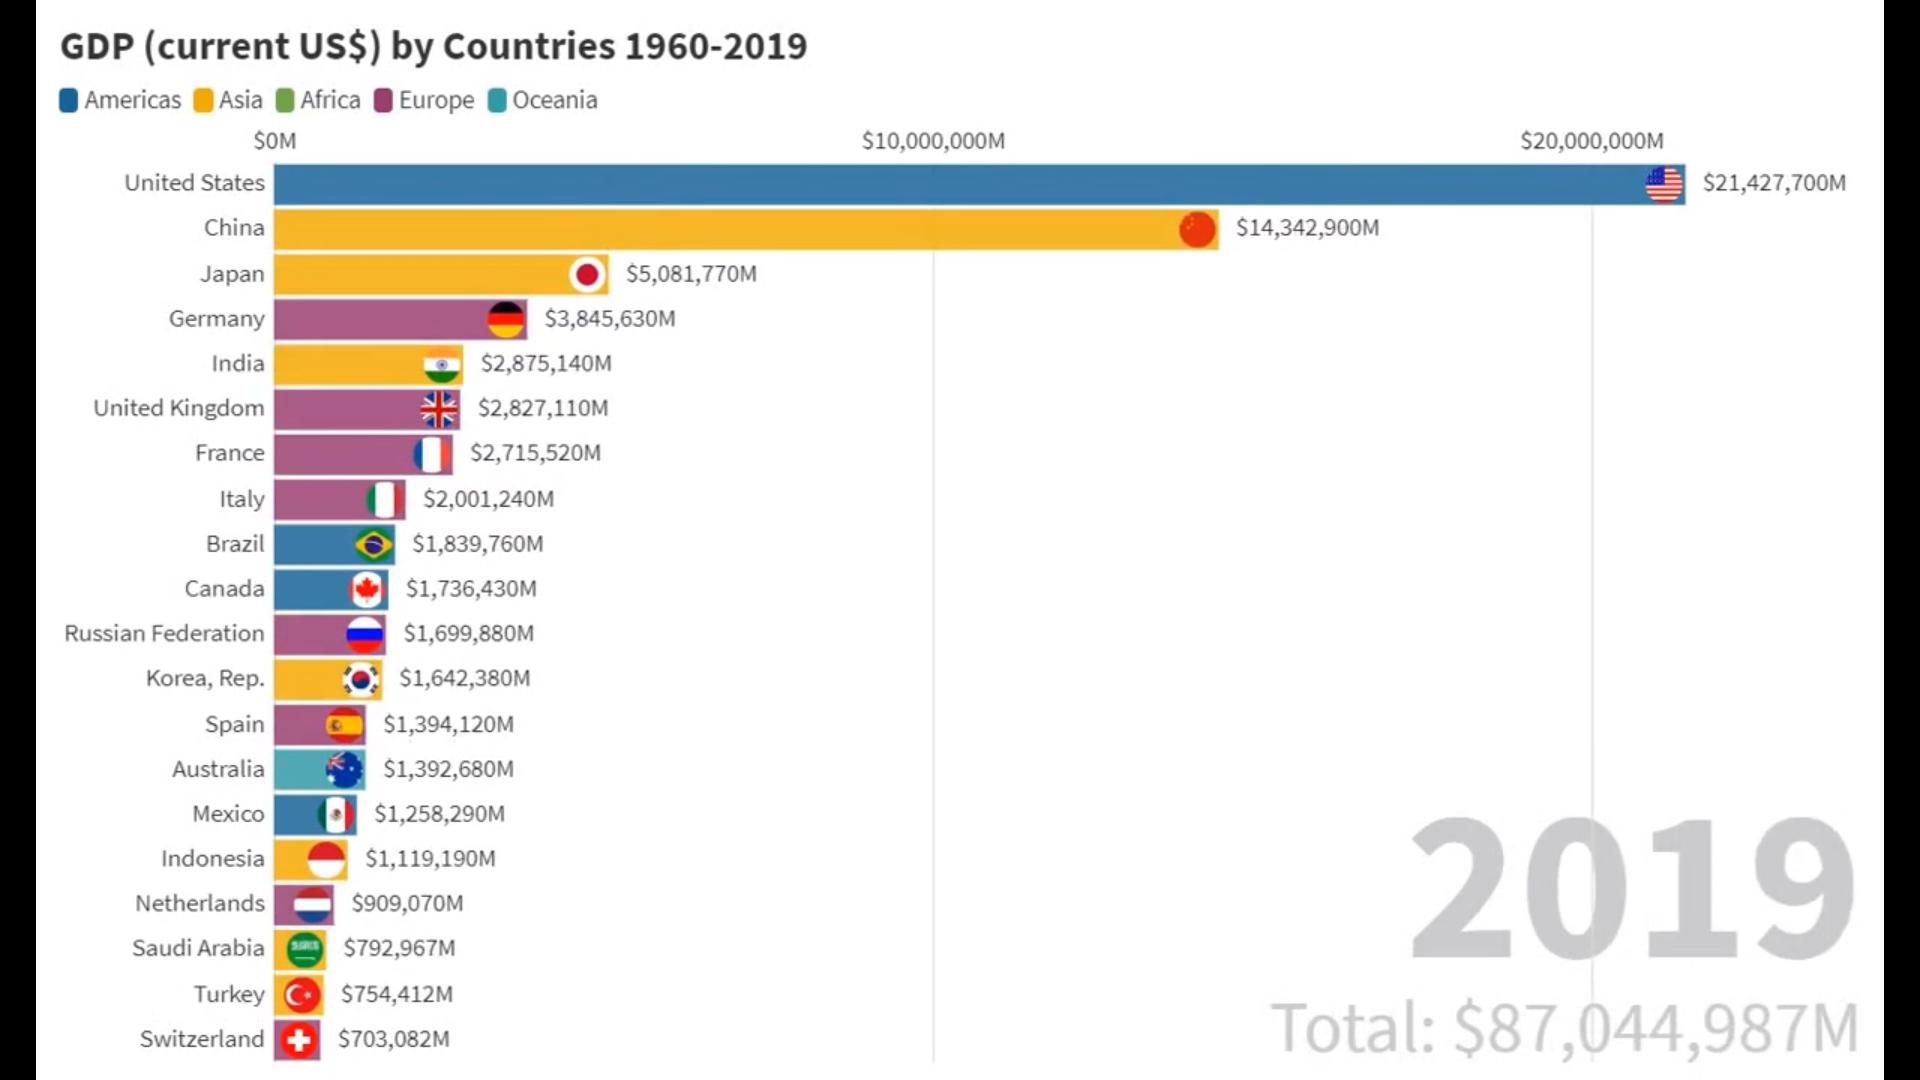 GDP 1960-2019